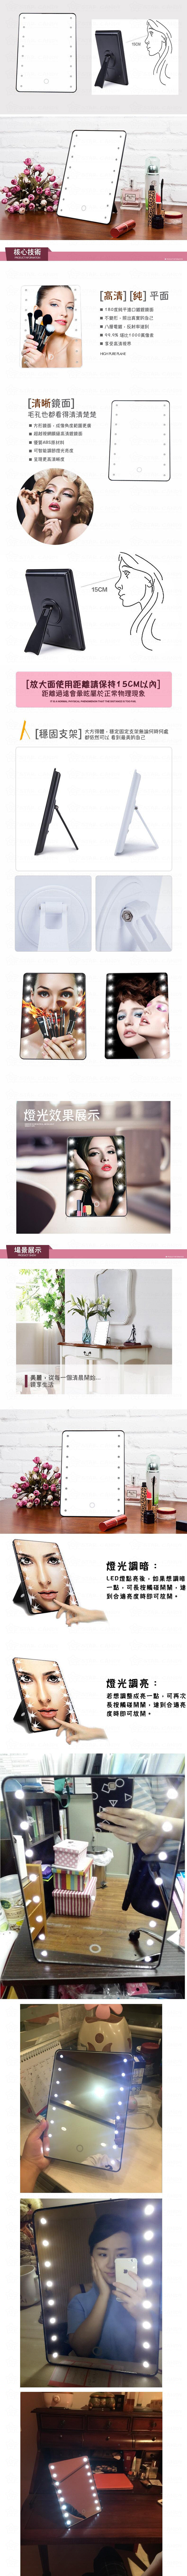 LED化妝鏡(浮水印)